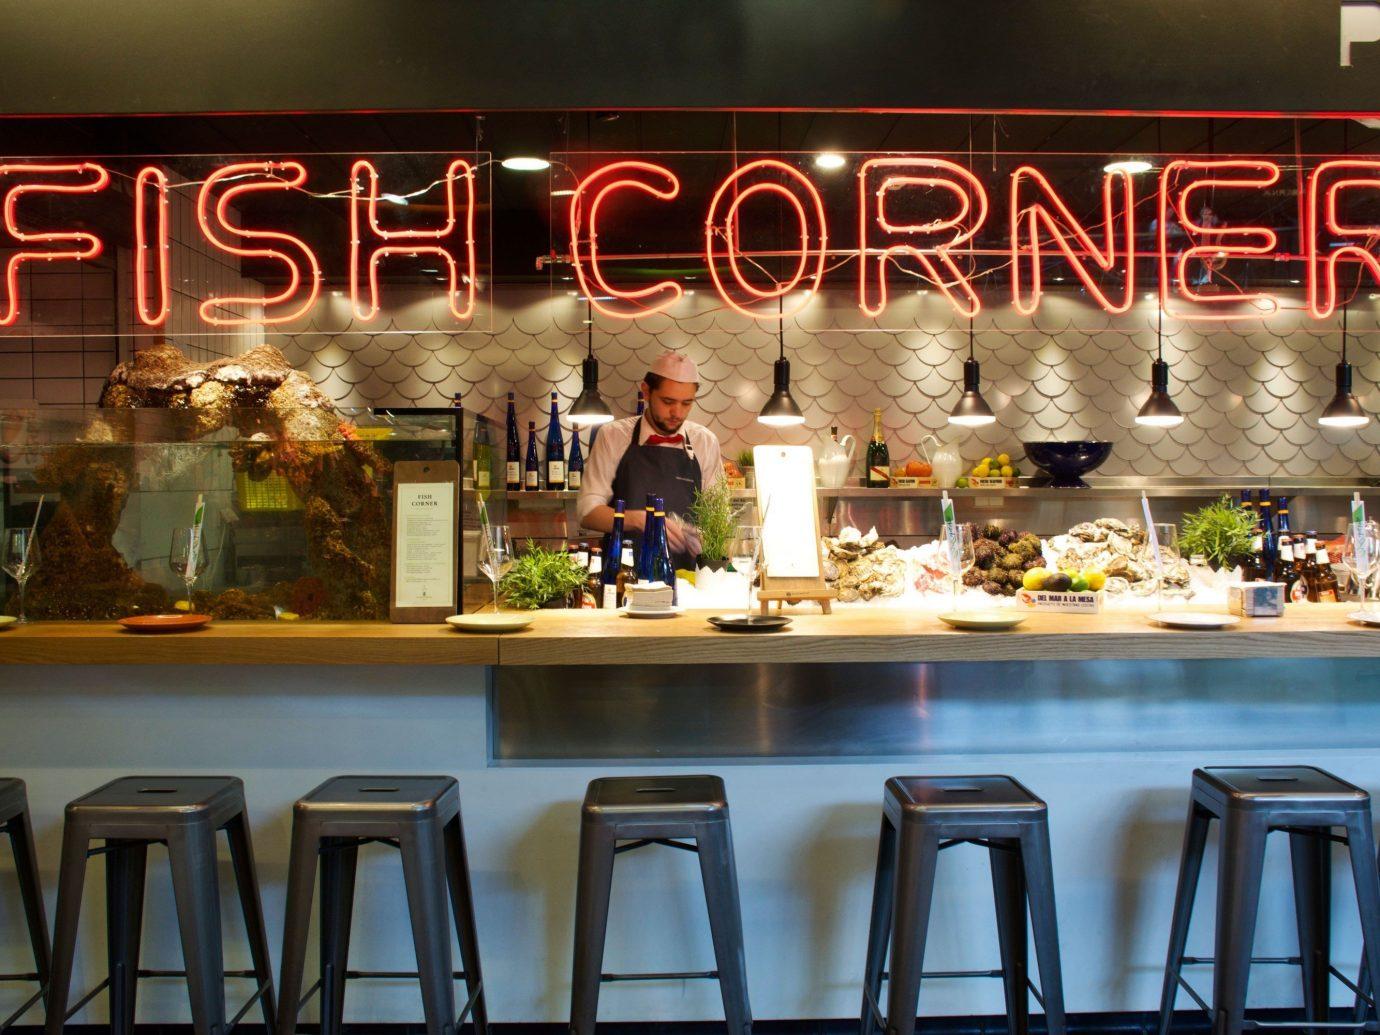 Trip Ideas indoor meal restaurant Bar scene Shop